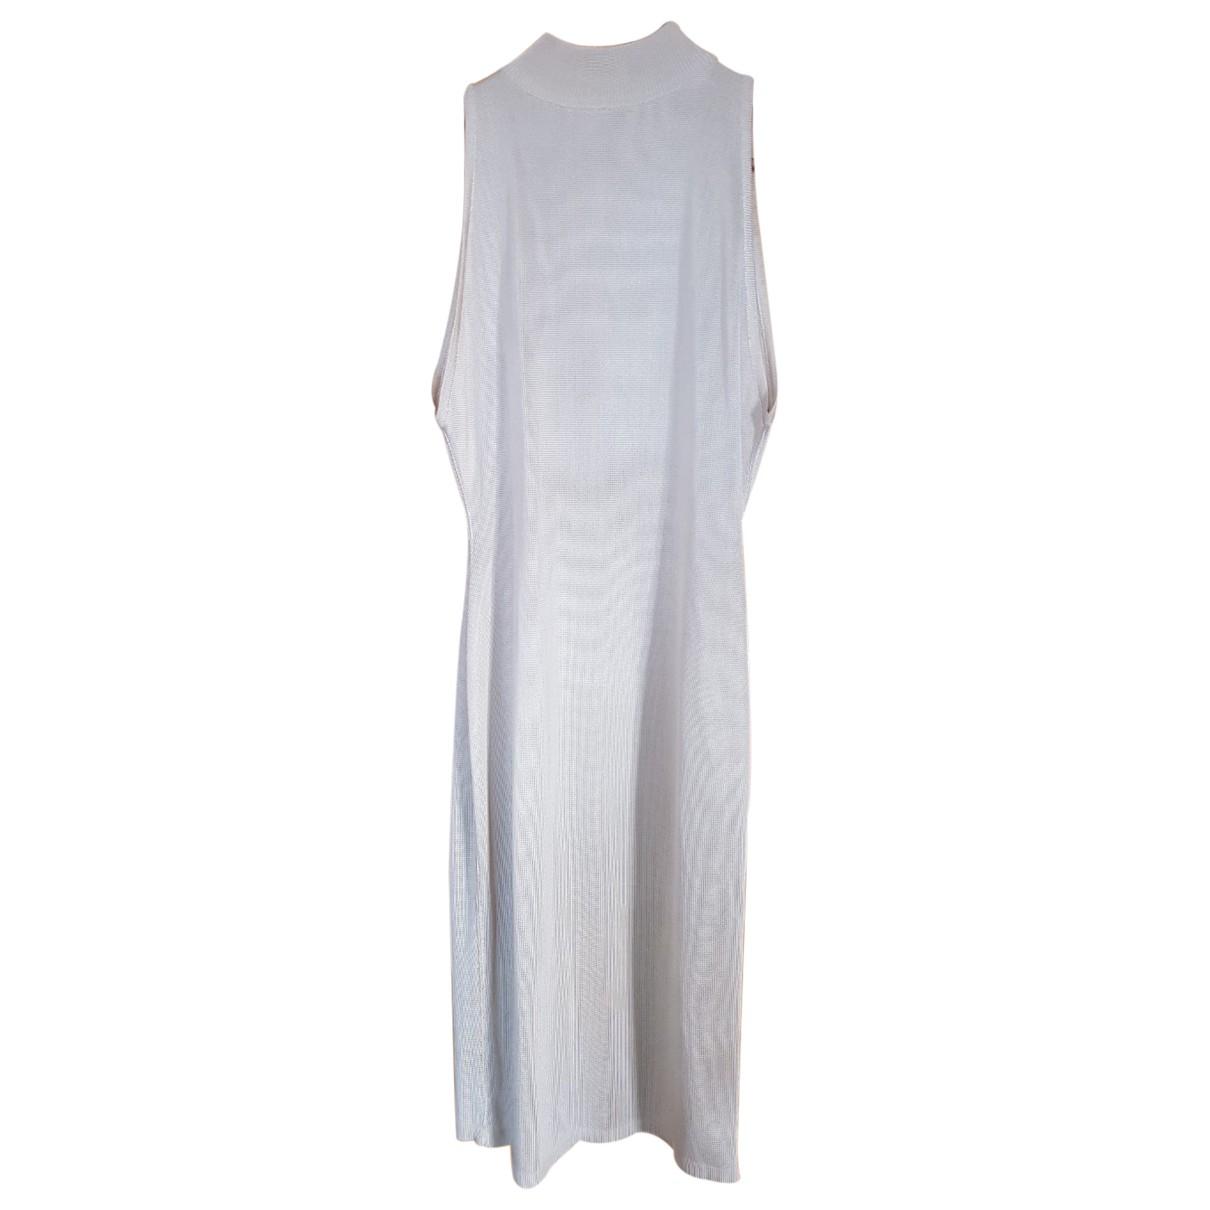 Alaïa \N Beige dress for Women S International